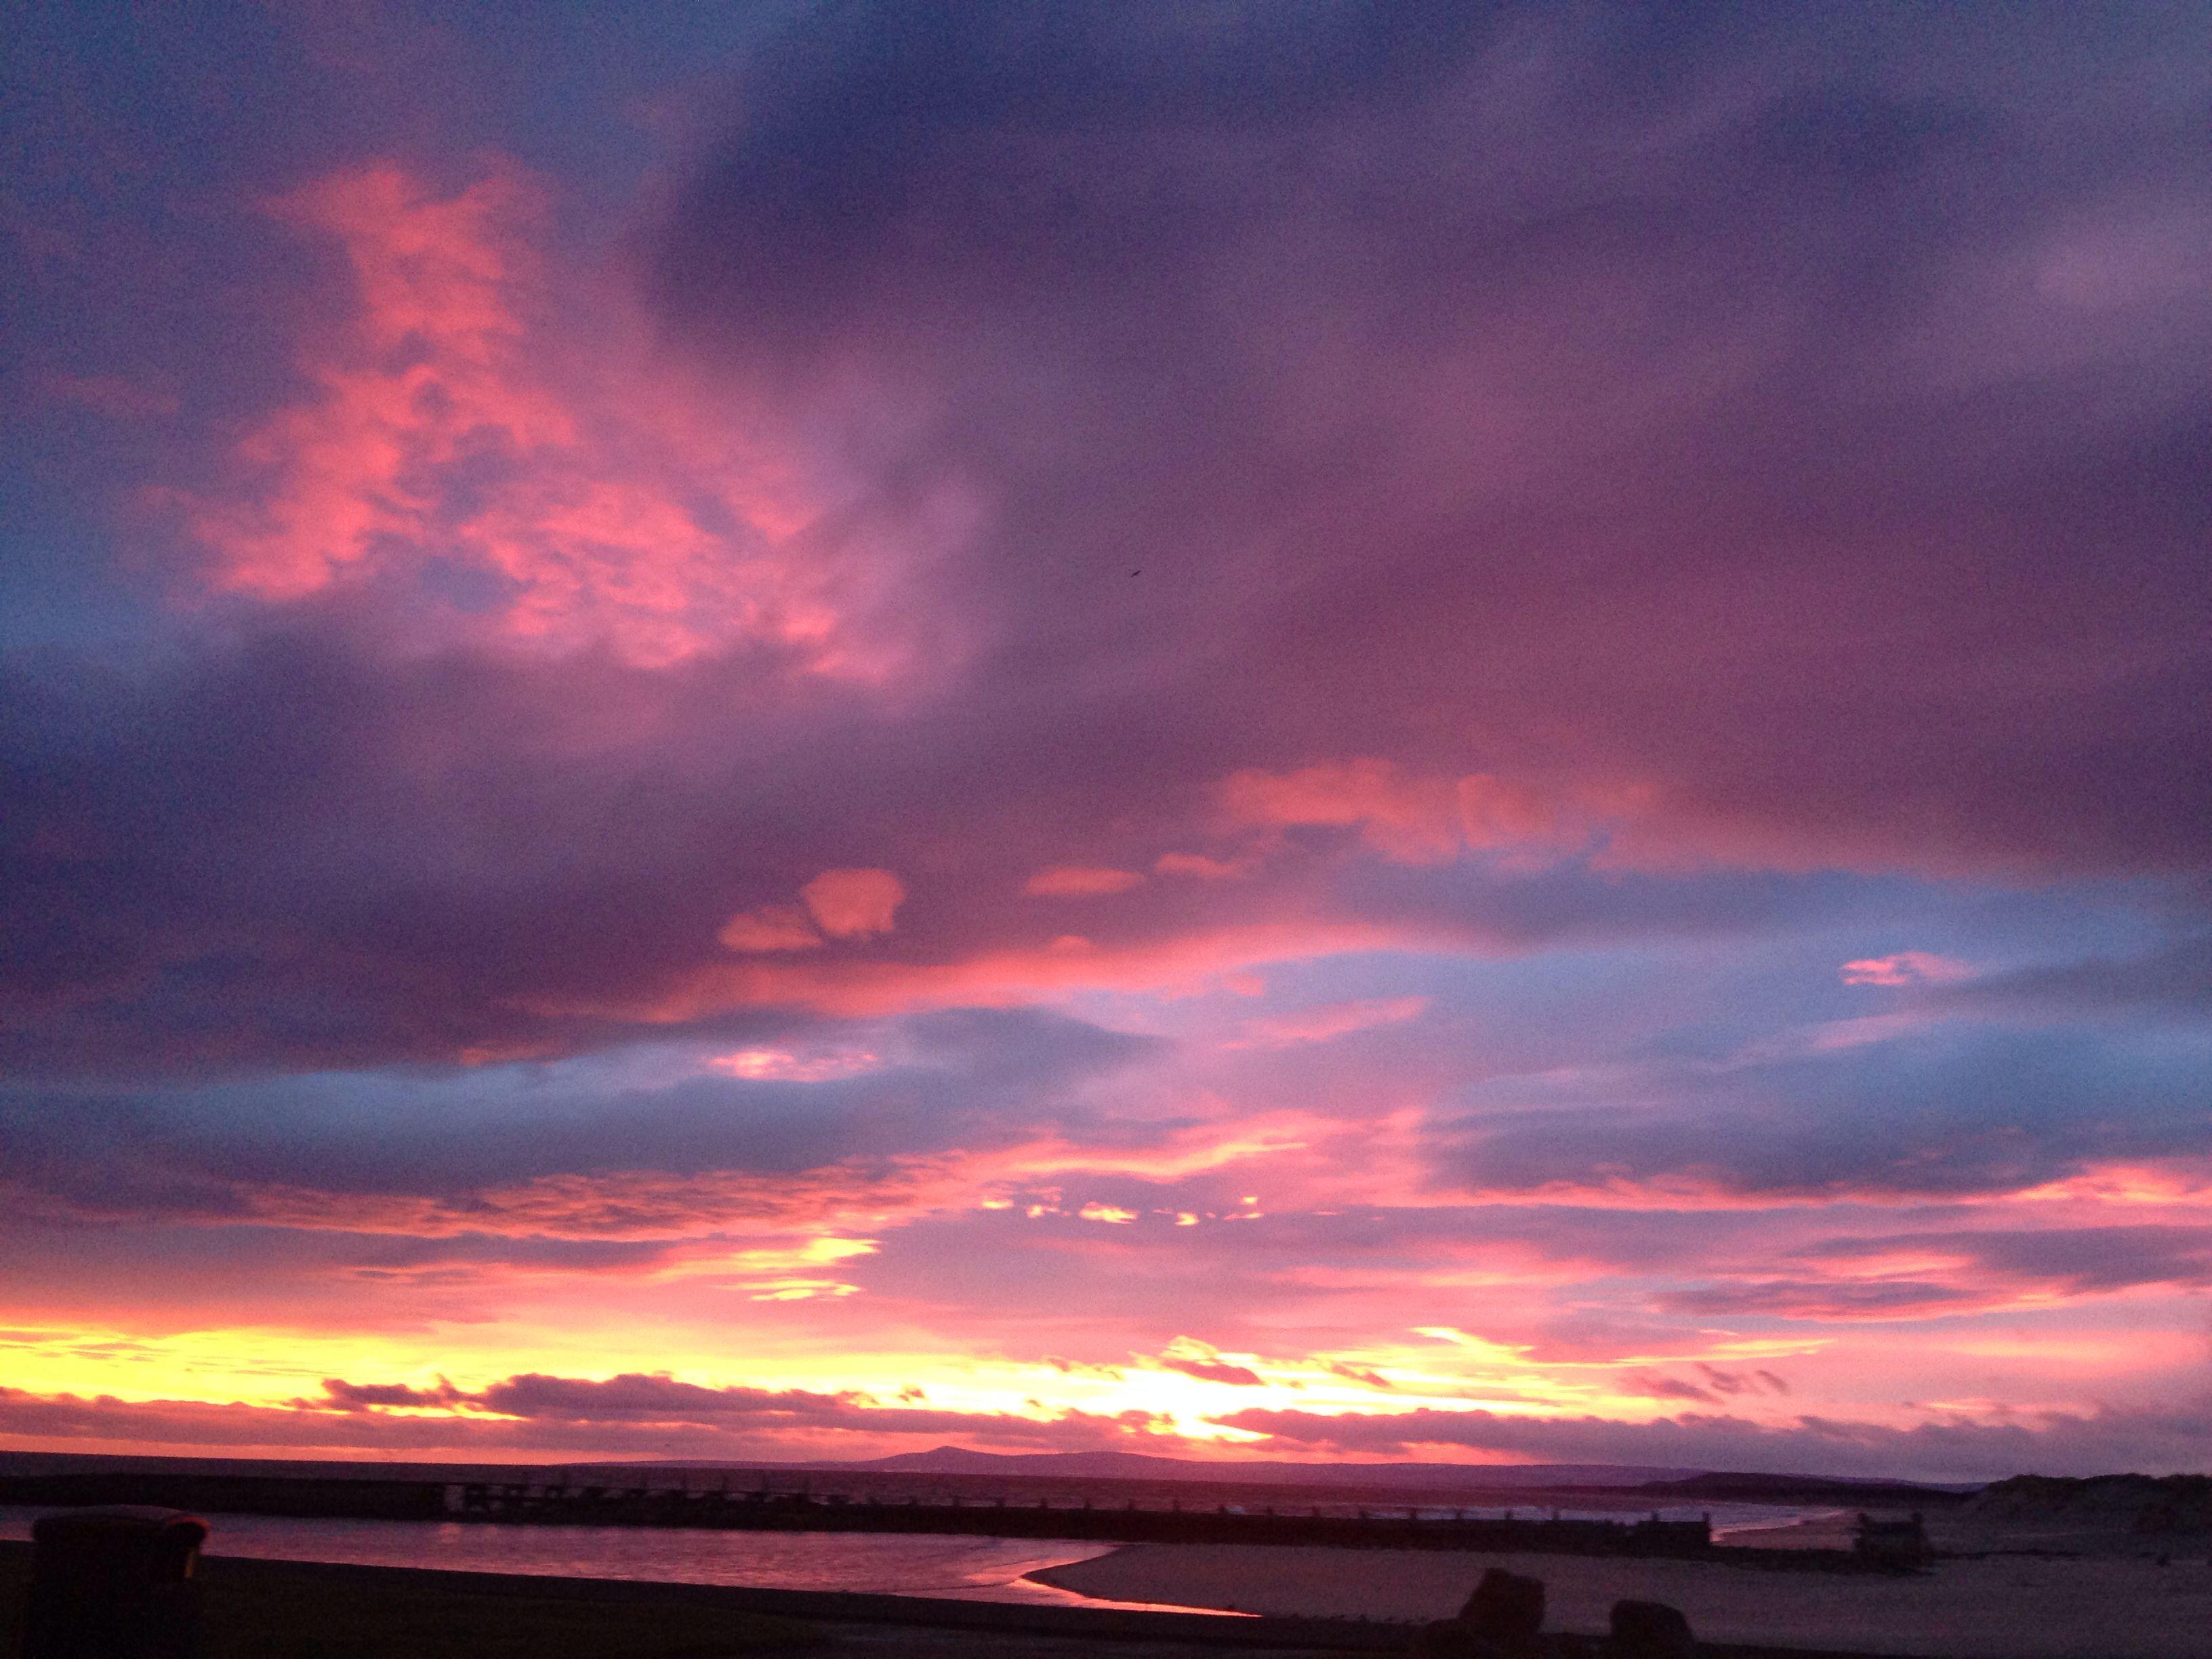 East Beach Lossiemouth Sunrise Sunset Clouds Sunrise Pink clouds sunset dusk coast rocks